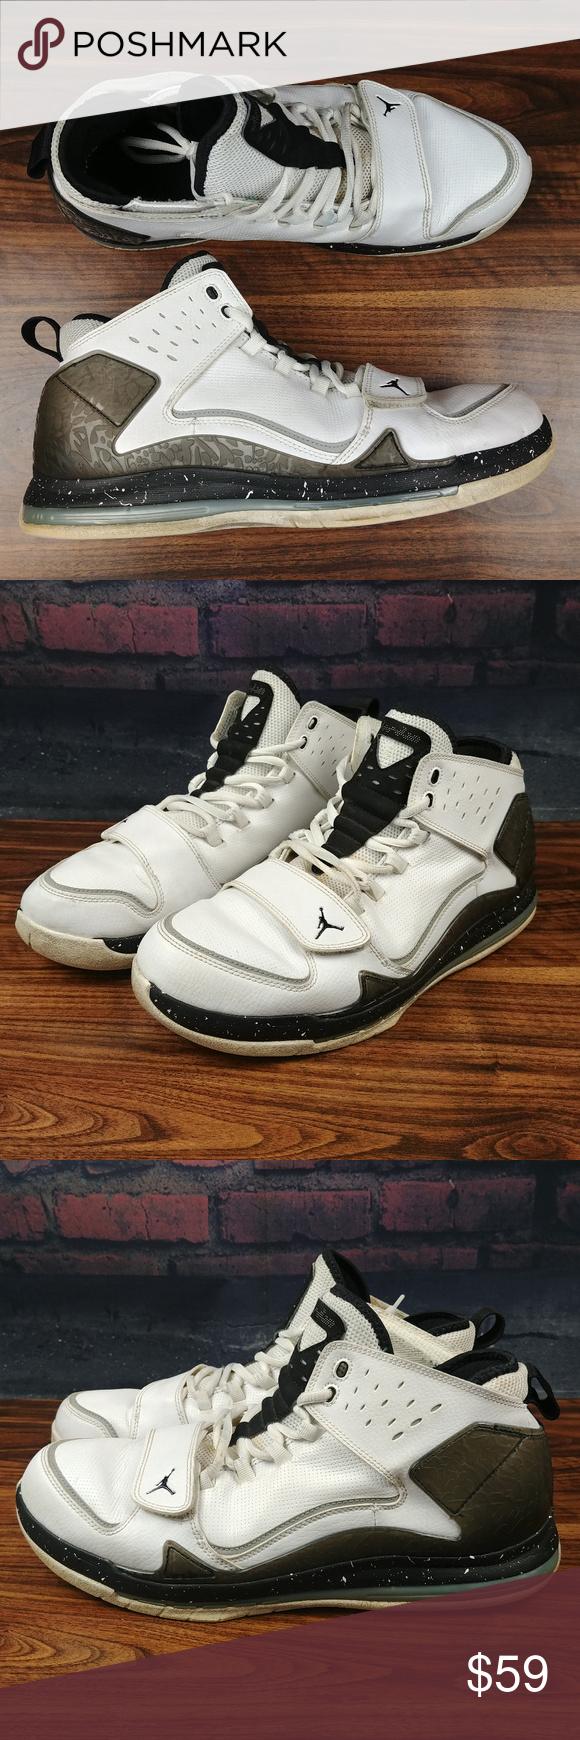 c3c046574742e3 Nike Air Jordan Evolution 85 Basketball Shoes Mens Nike Air Jordan  Evolution 85 Basketball Shoes Mens